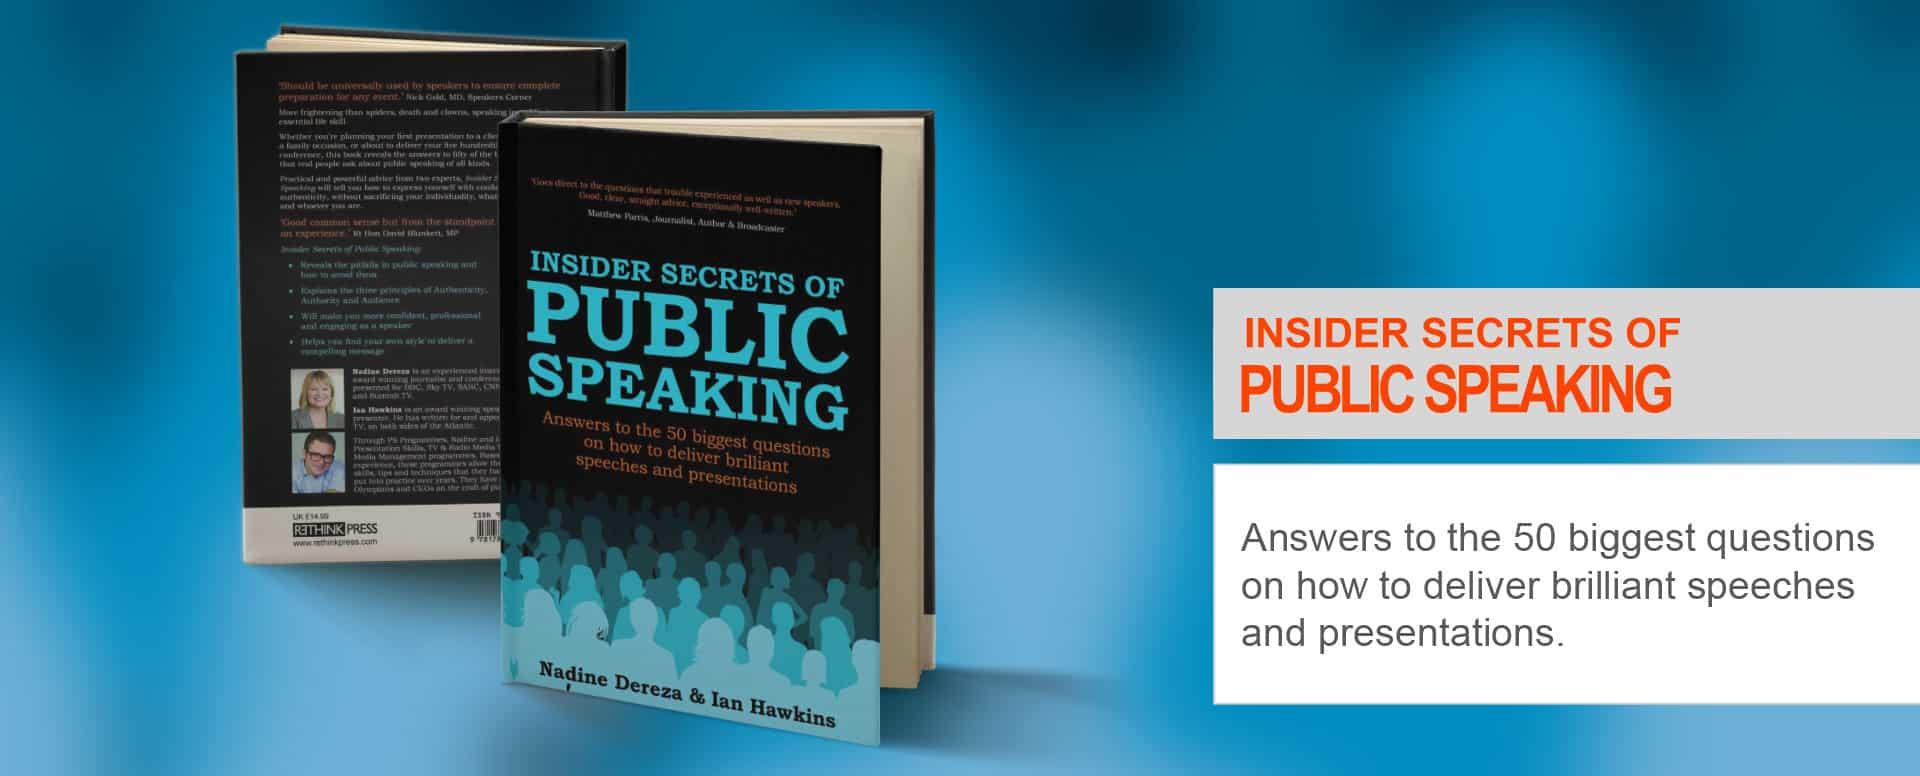 Insider secrets of public speaking